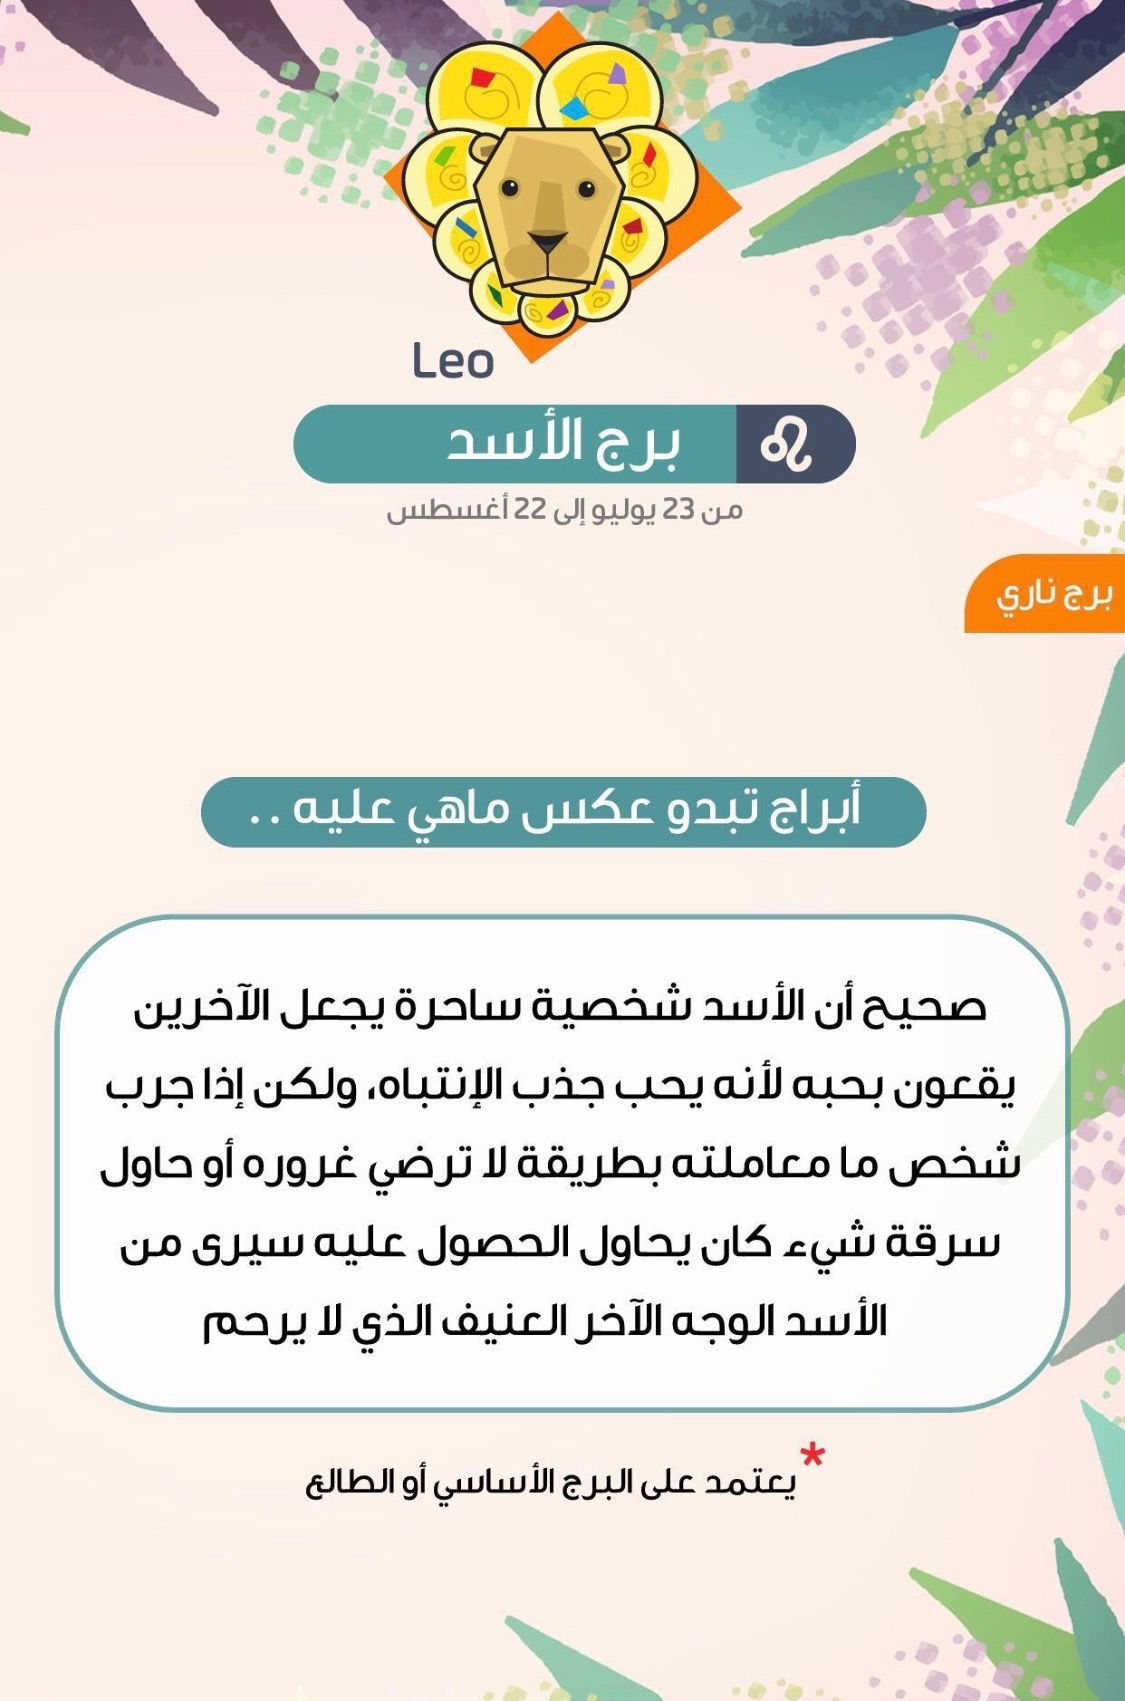 Pin By Samar Anan On Leo Others Leo Raa Good Morning